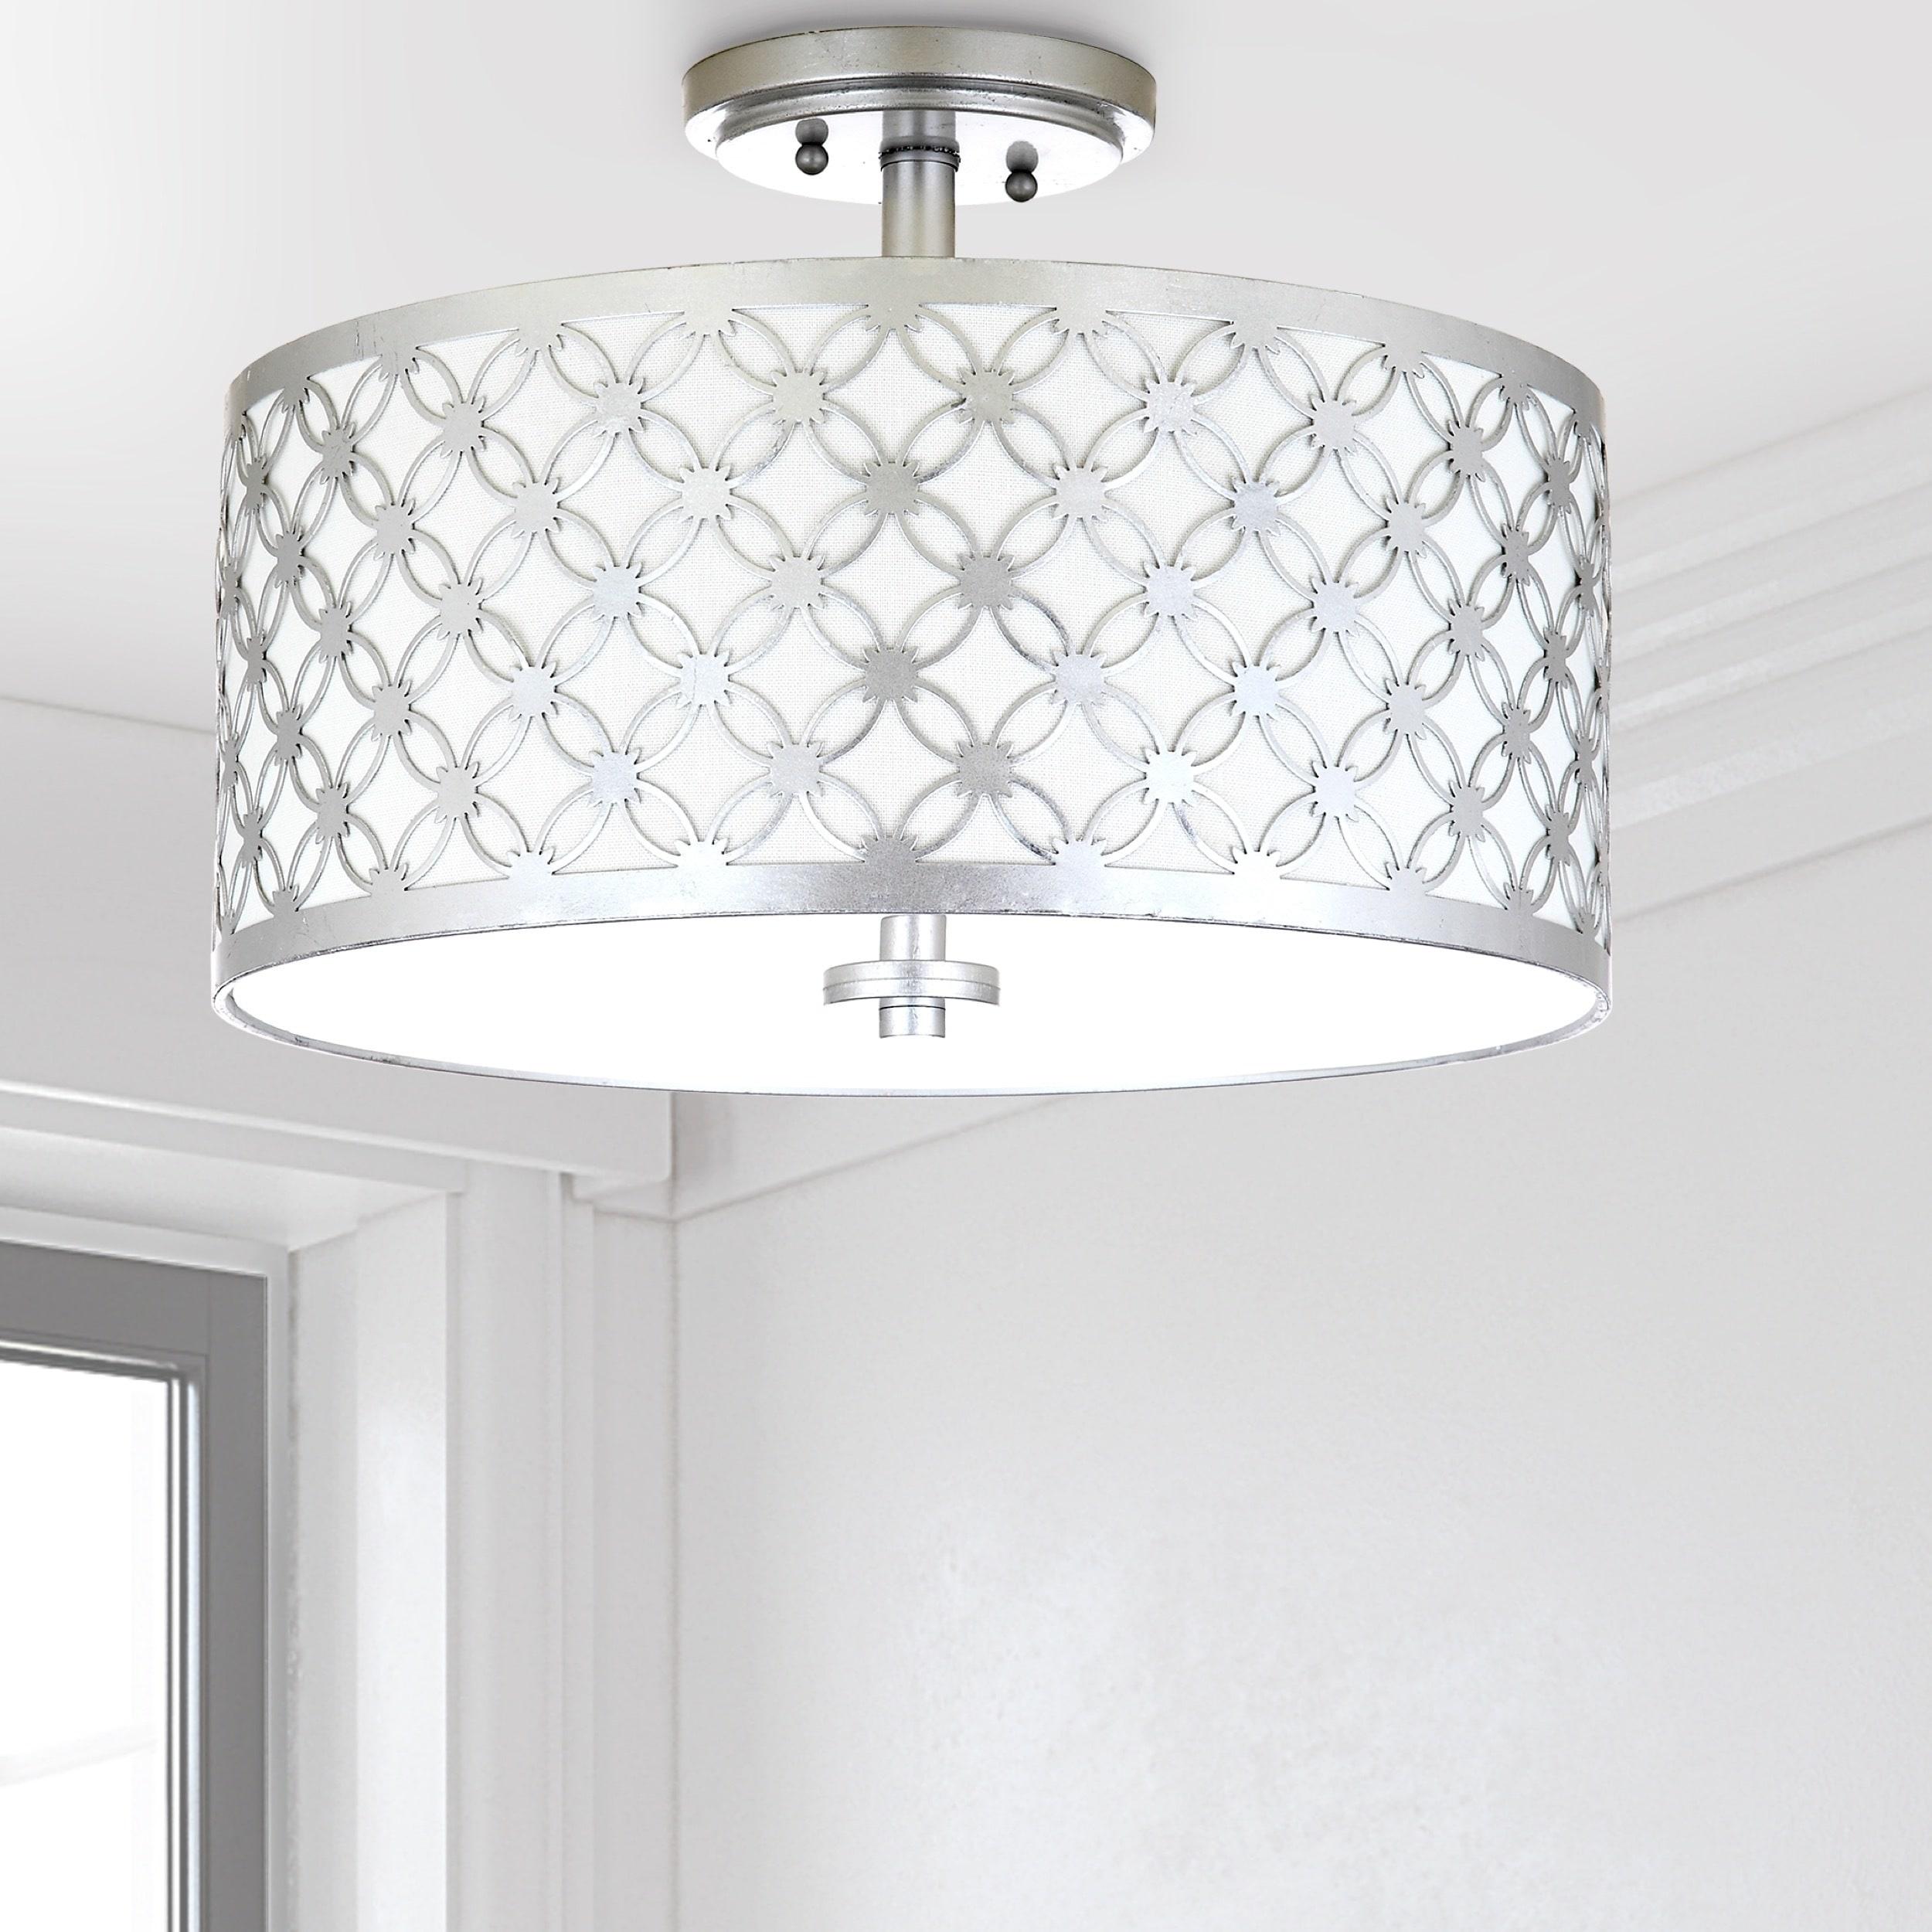 Safavieh lighting hutch 3 light silver flush mount